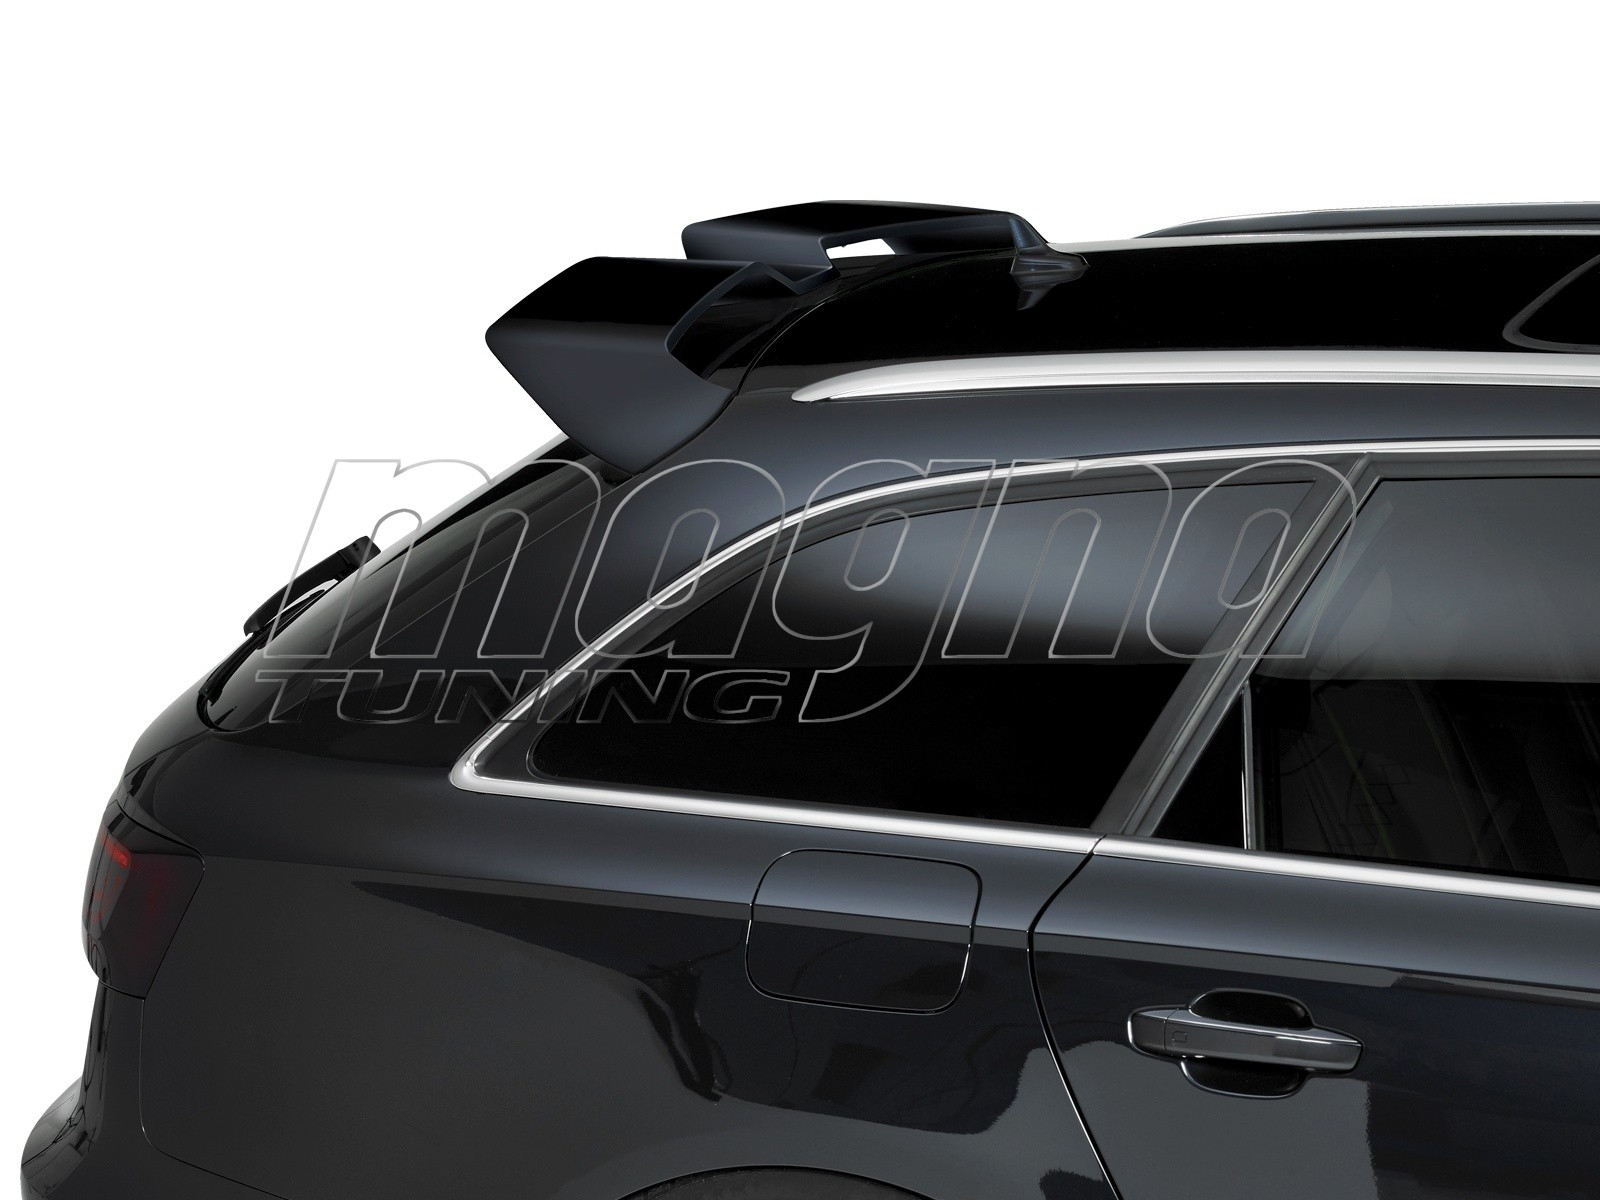 Audi A6 C7 / 4G Crono Heckflugel